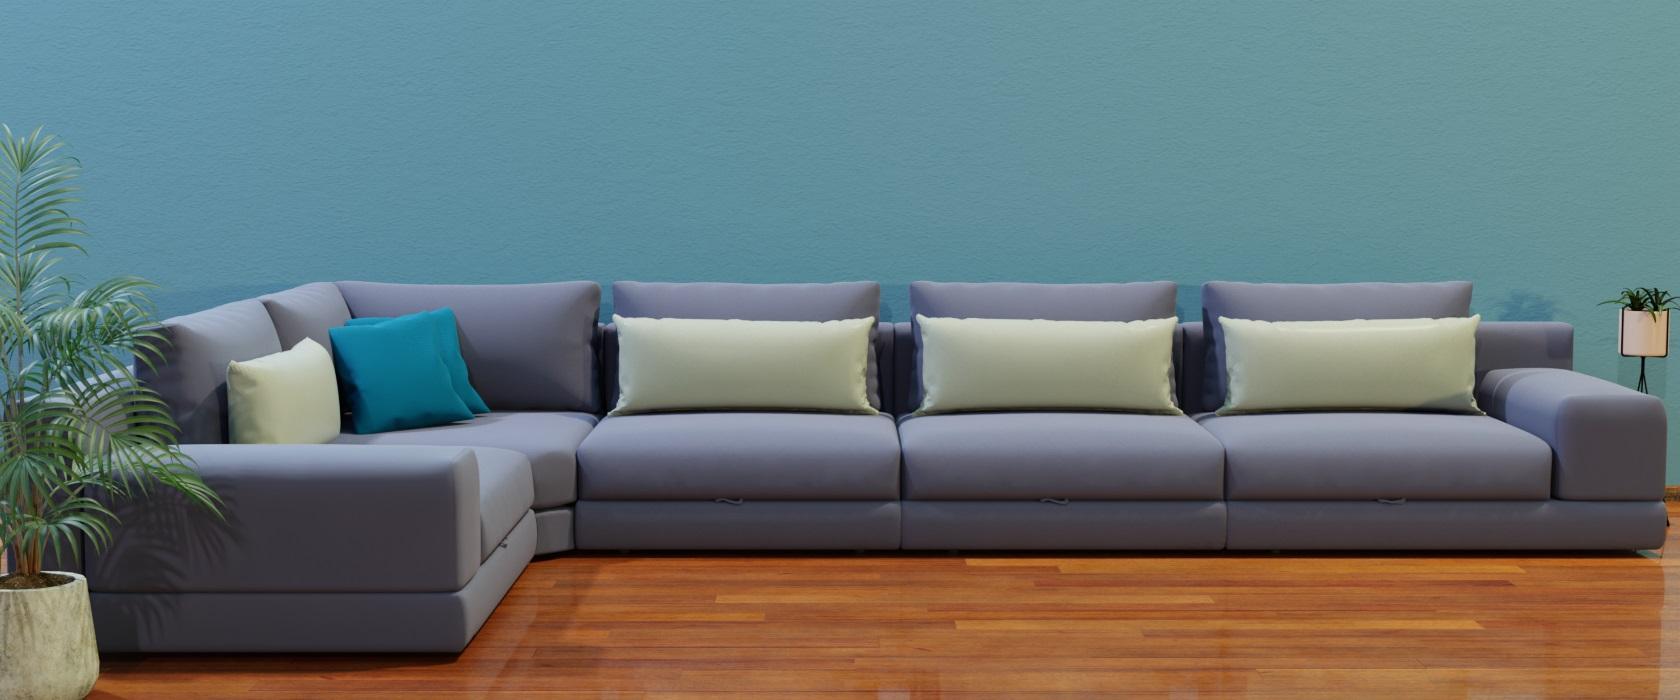 Модульний диван Dario 455x255 - Фото 2 - Pufetto